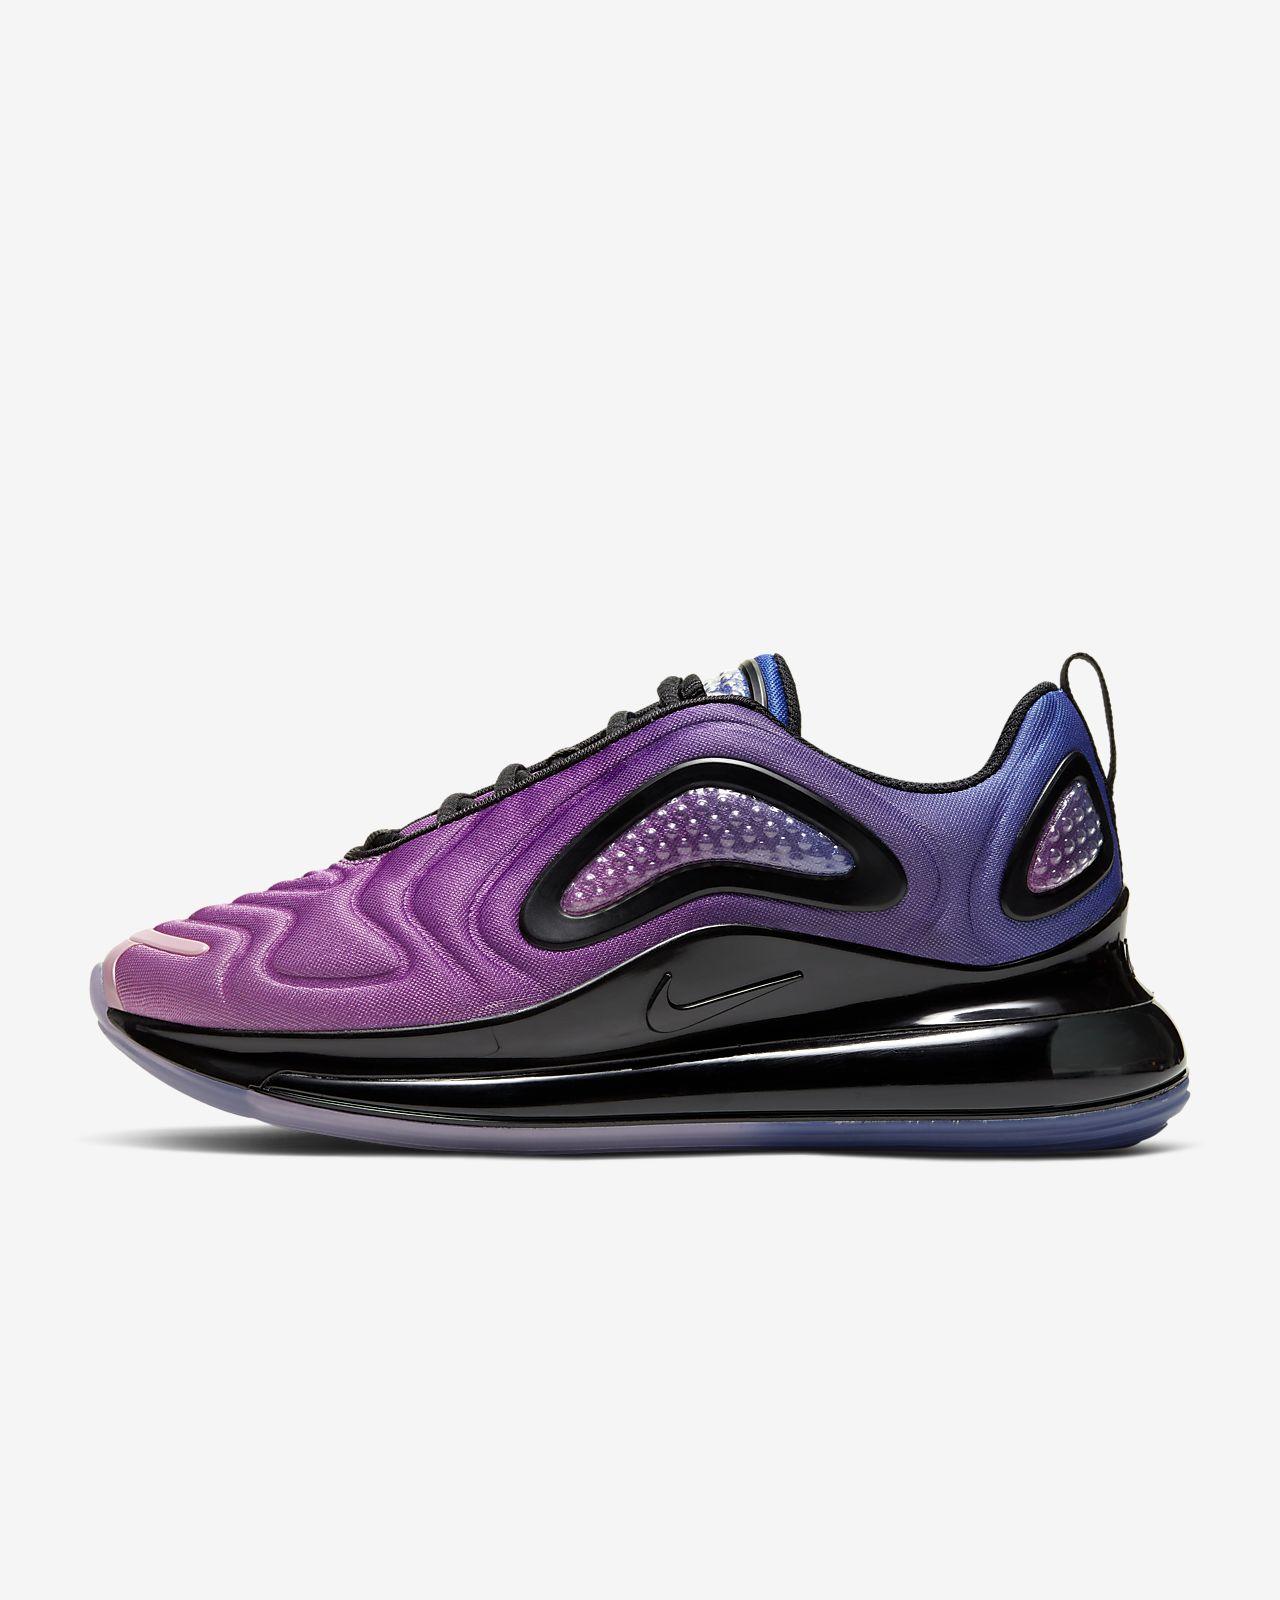 Nike Air Max 720 Til Kvinder | footpatrol